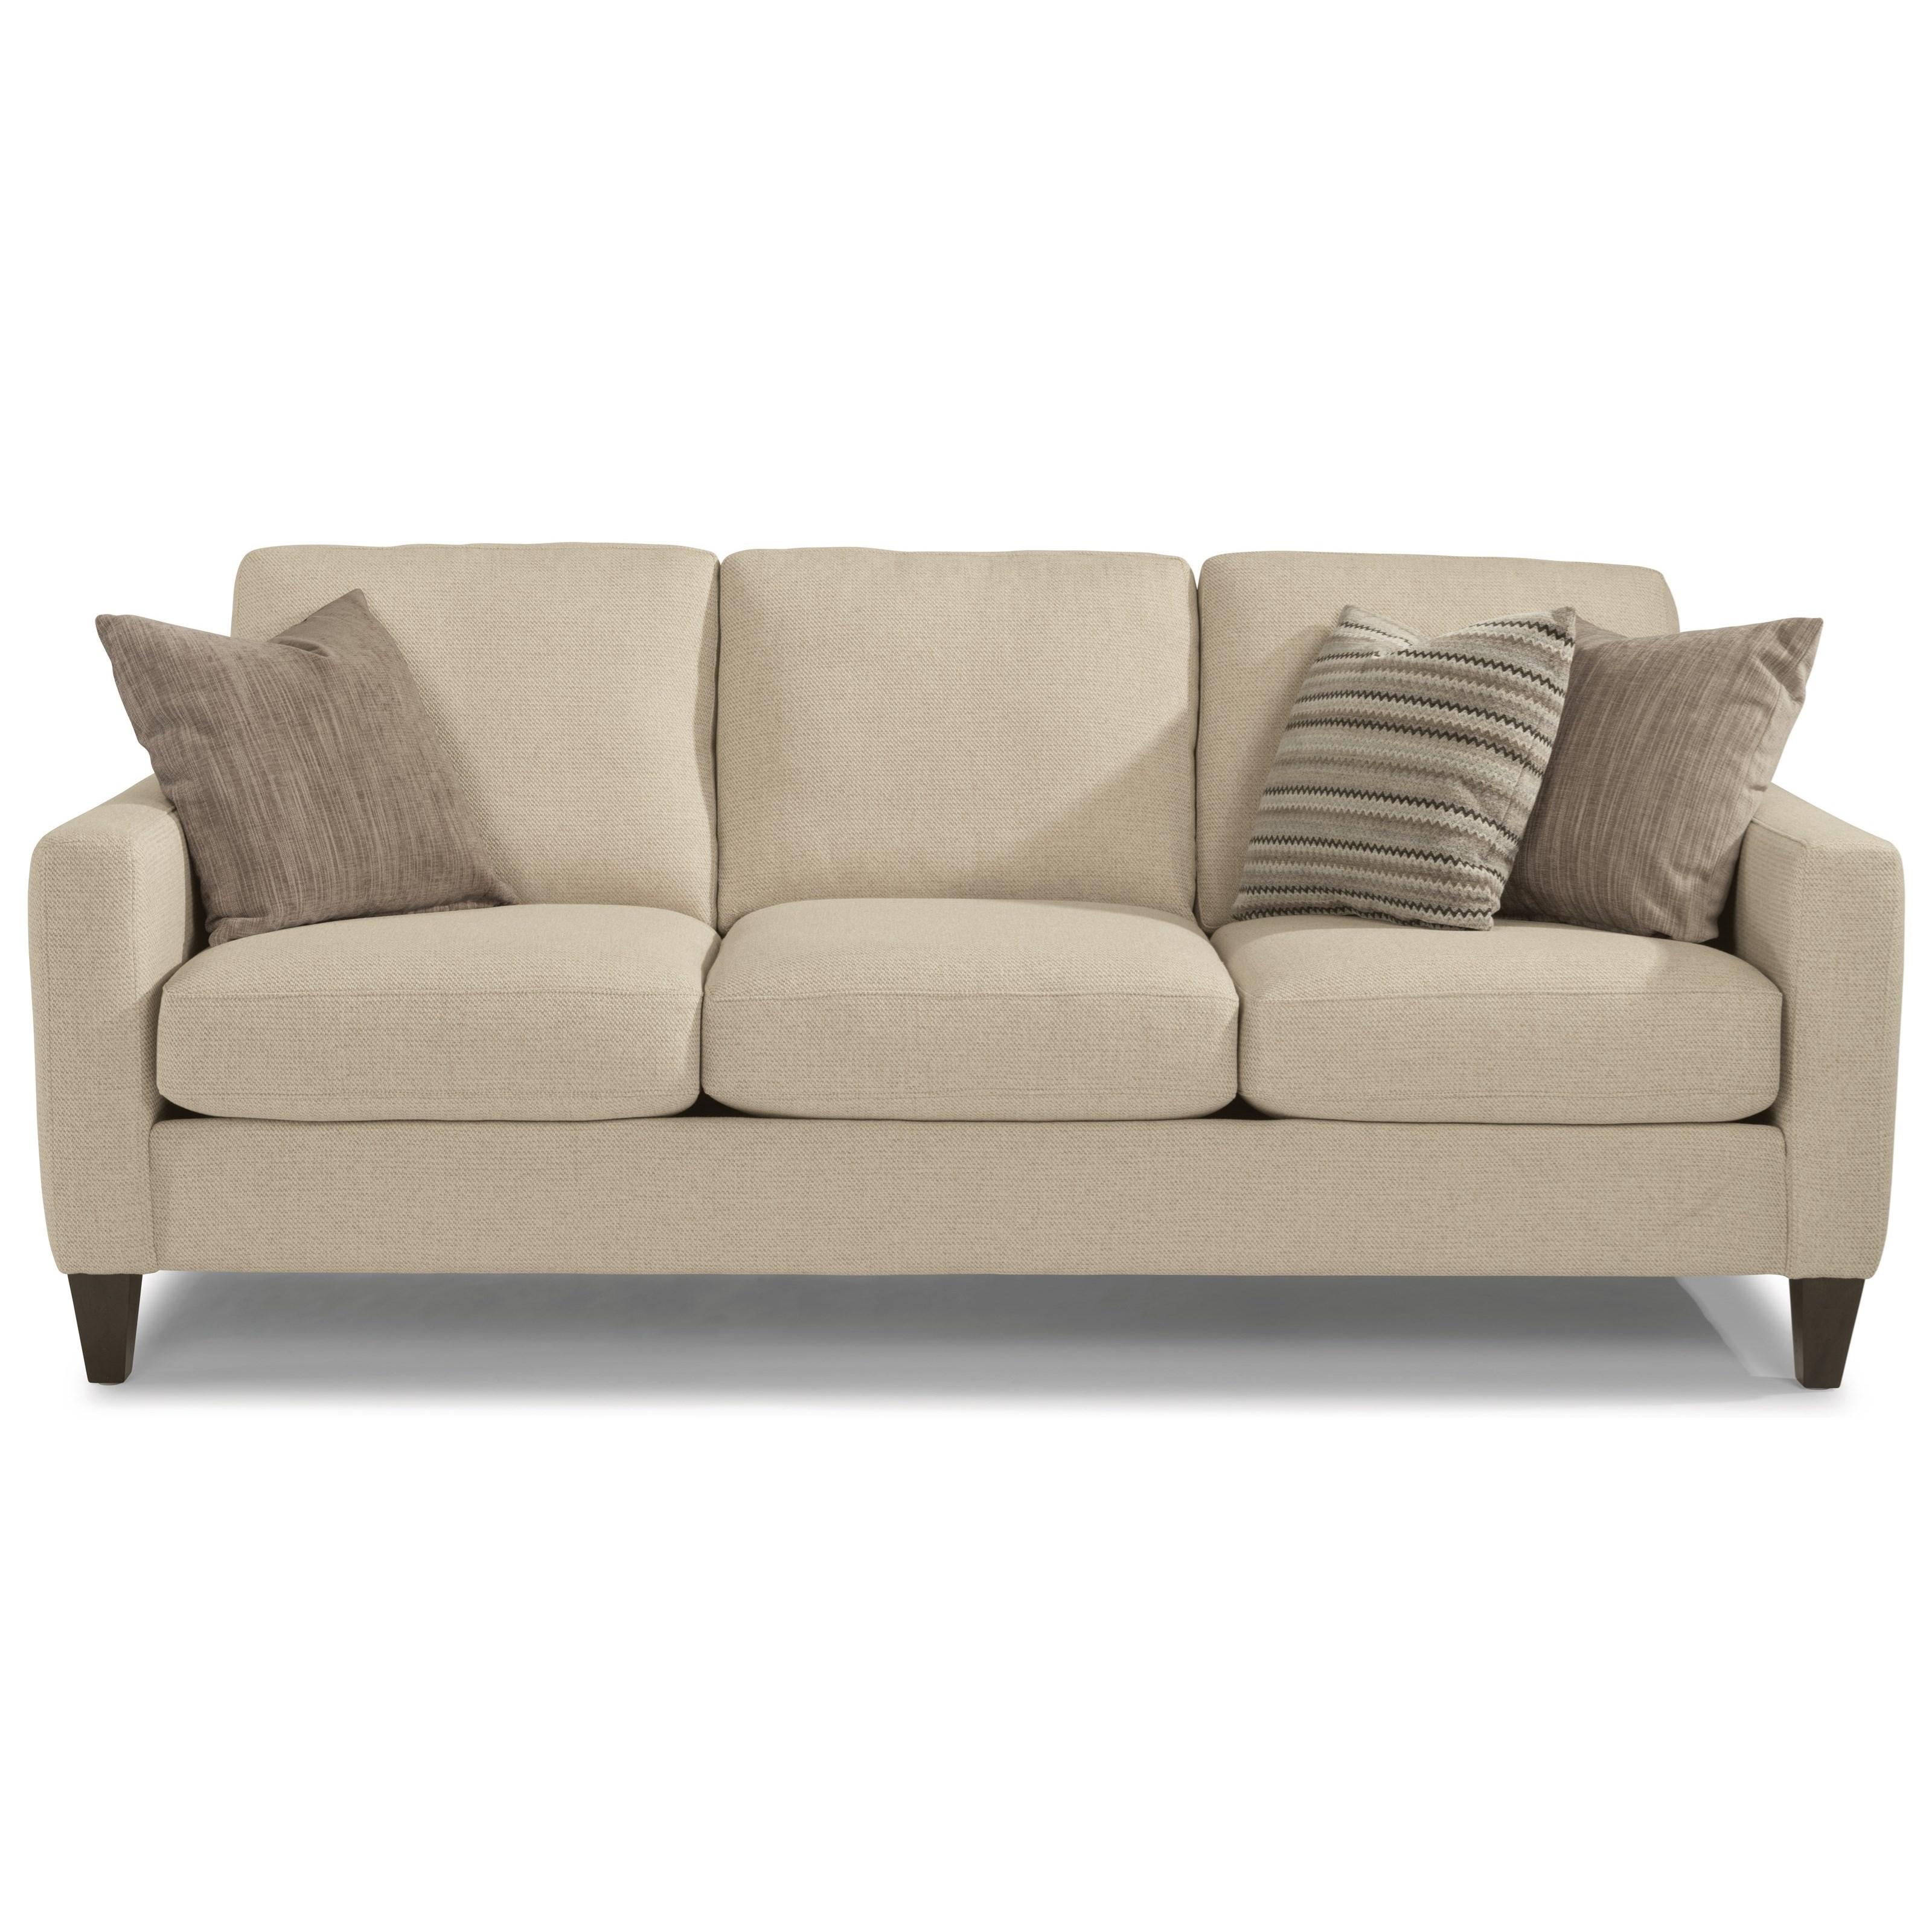 Superieur Flexsteel RiverContemporary Sofa; Flexsteel RiverContemporary ...